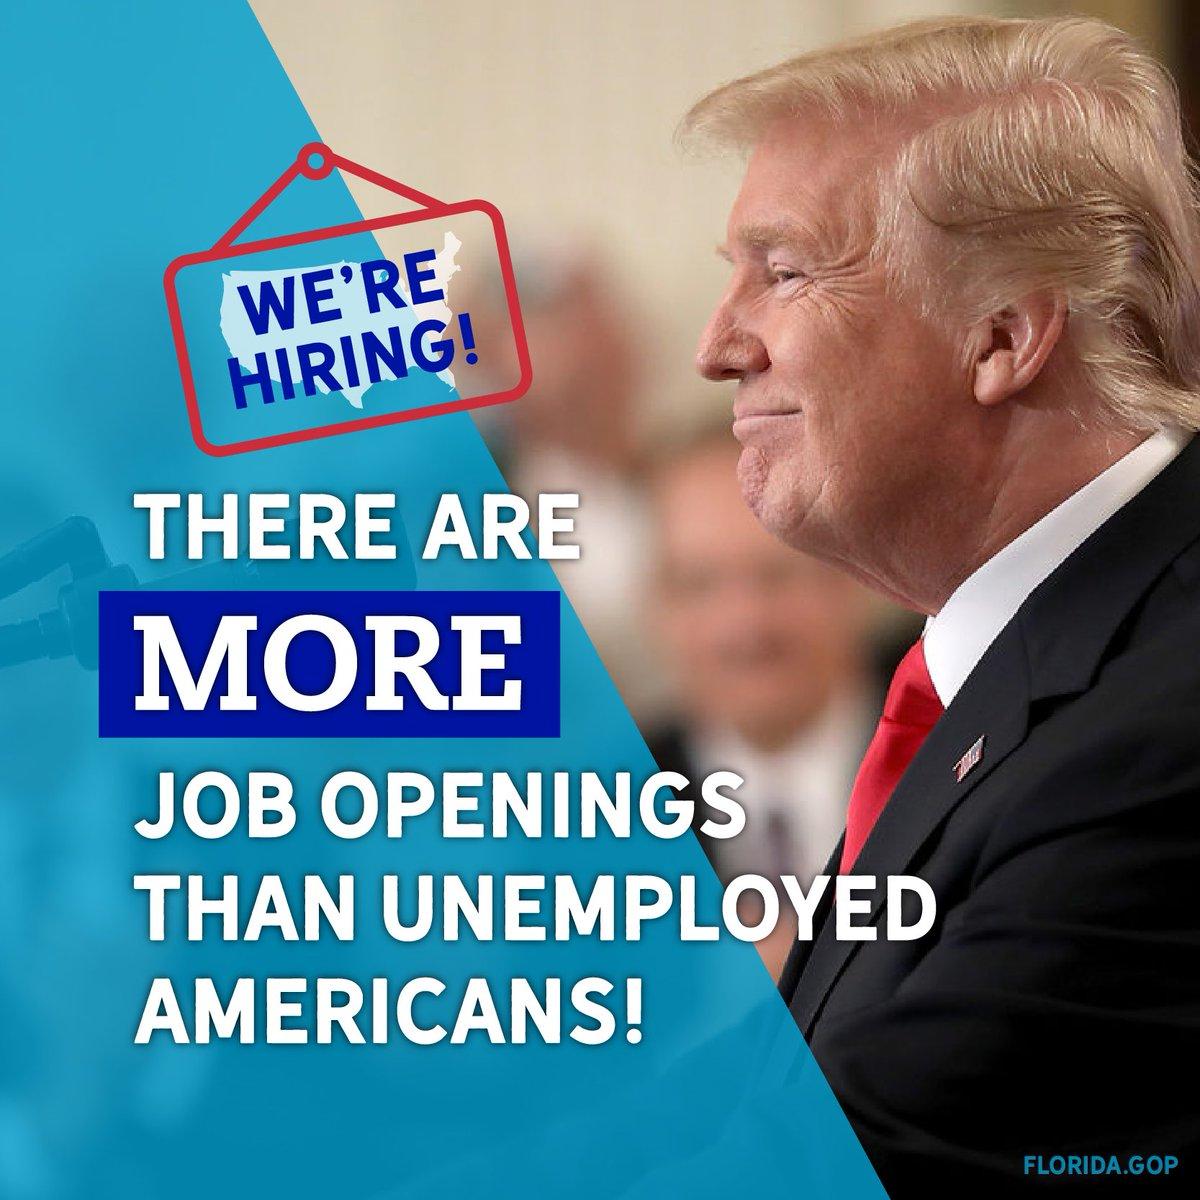 Jobs, jobs, jobs! America is thriving under President @RealDonaldTrump.